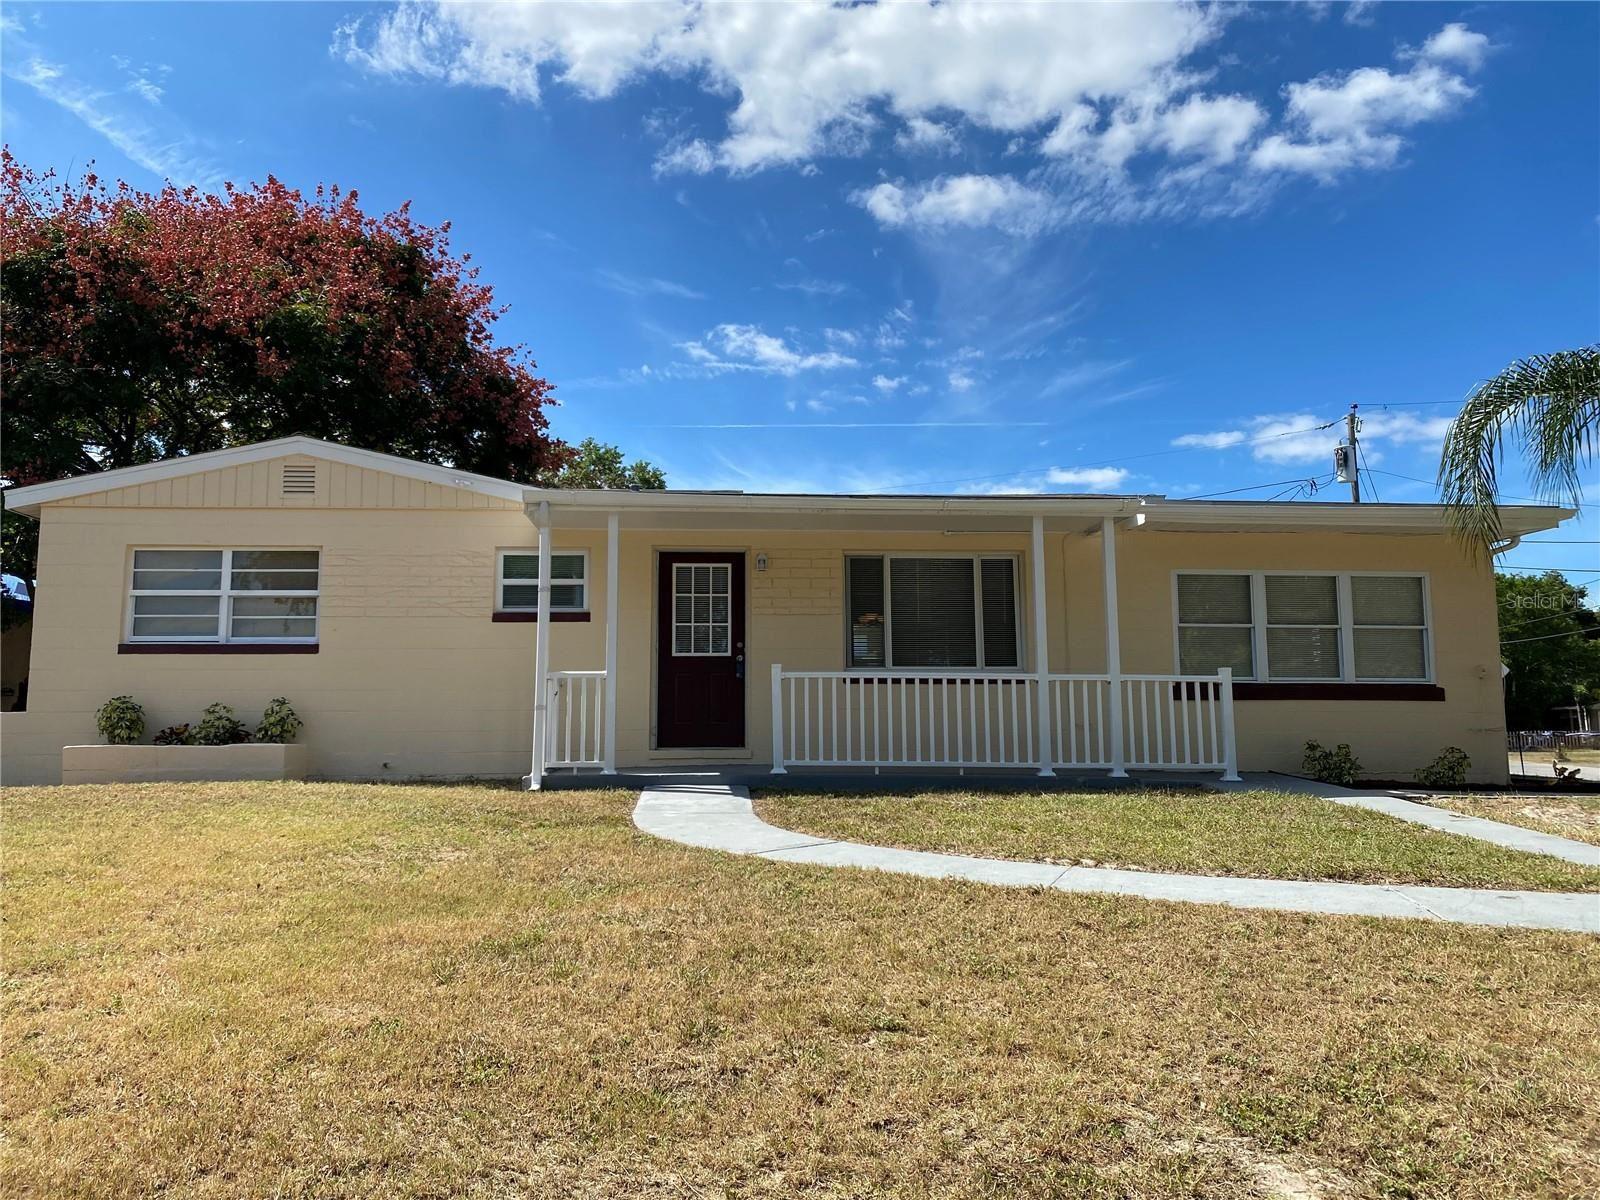 7209 RAMOR LANE, New Port Richey, FL 34653 - MLS#: U8140633